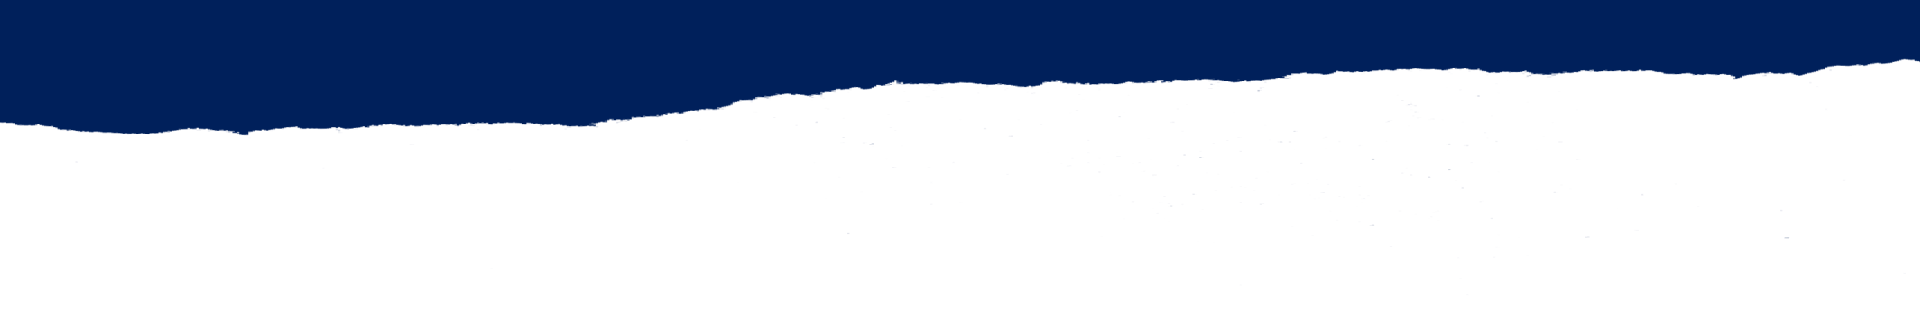 paper-rip-blue-bottom